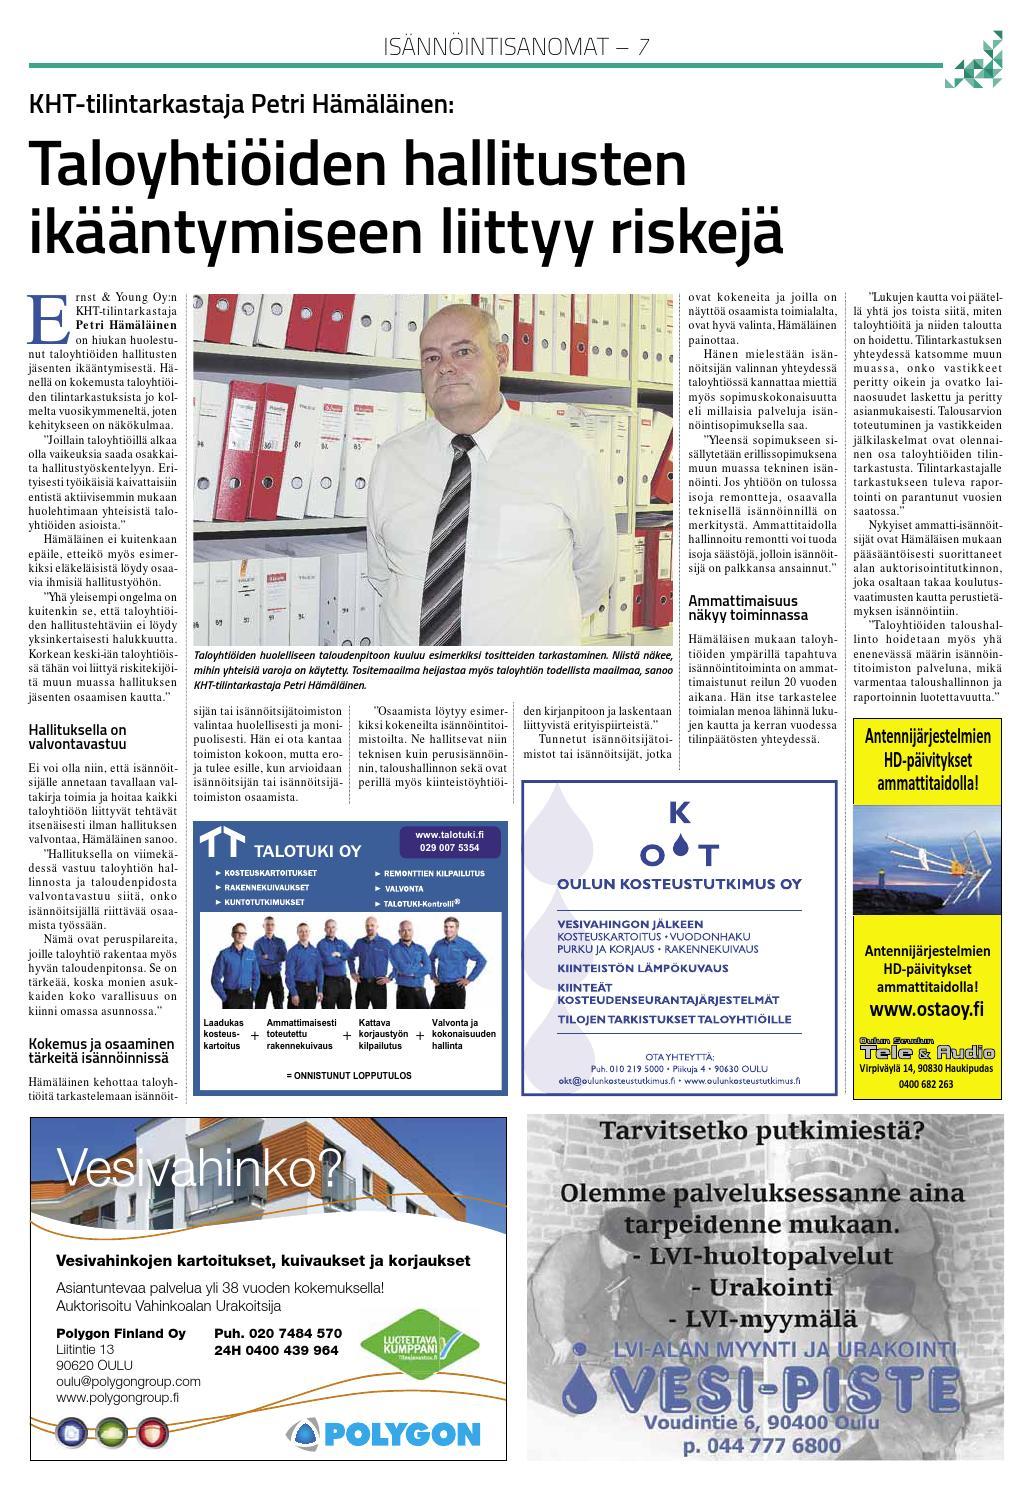 Reim Isännöinti Oulu